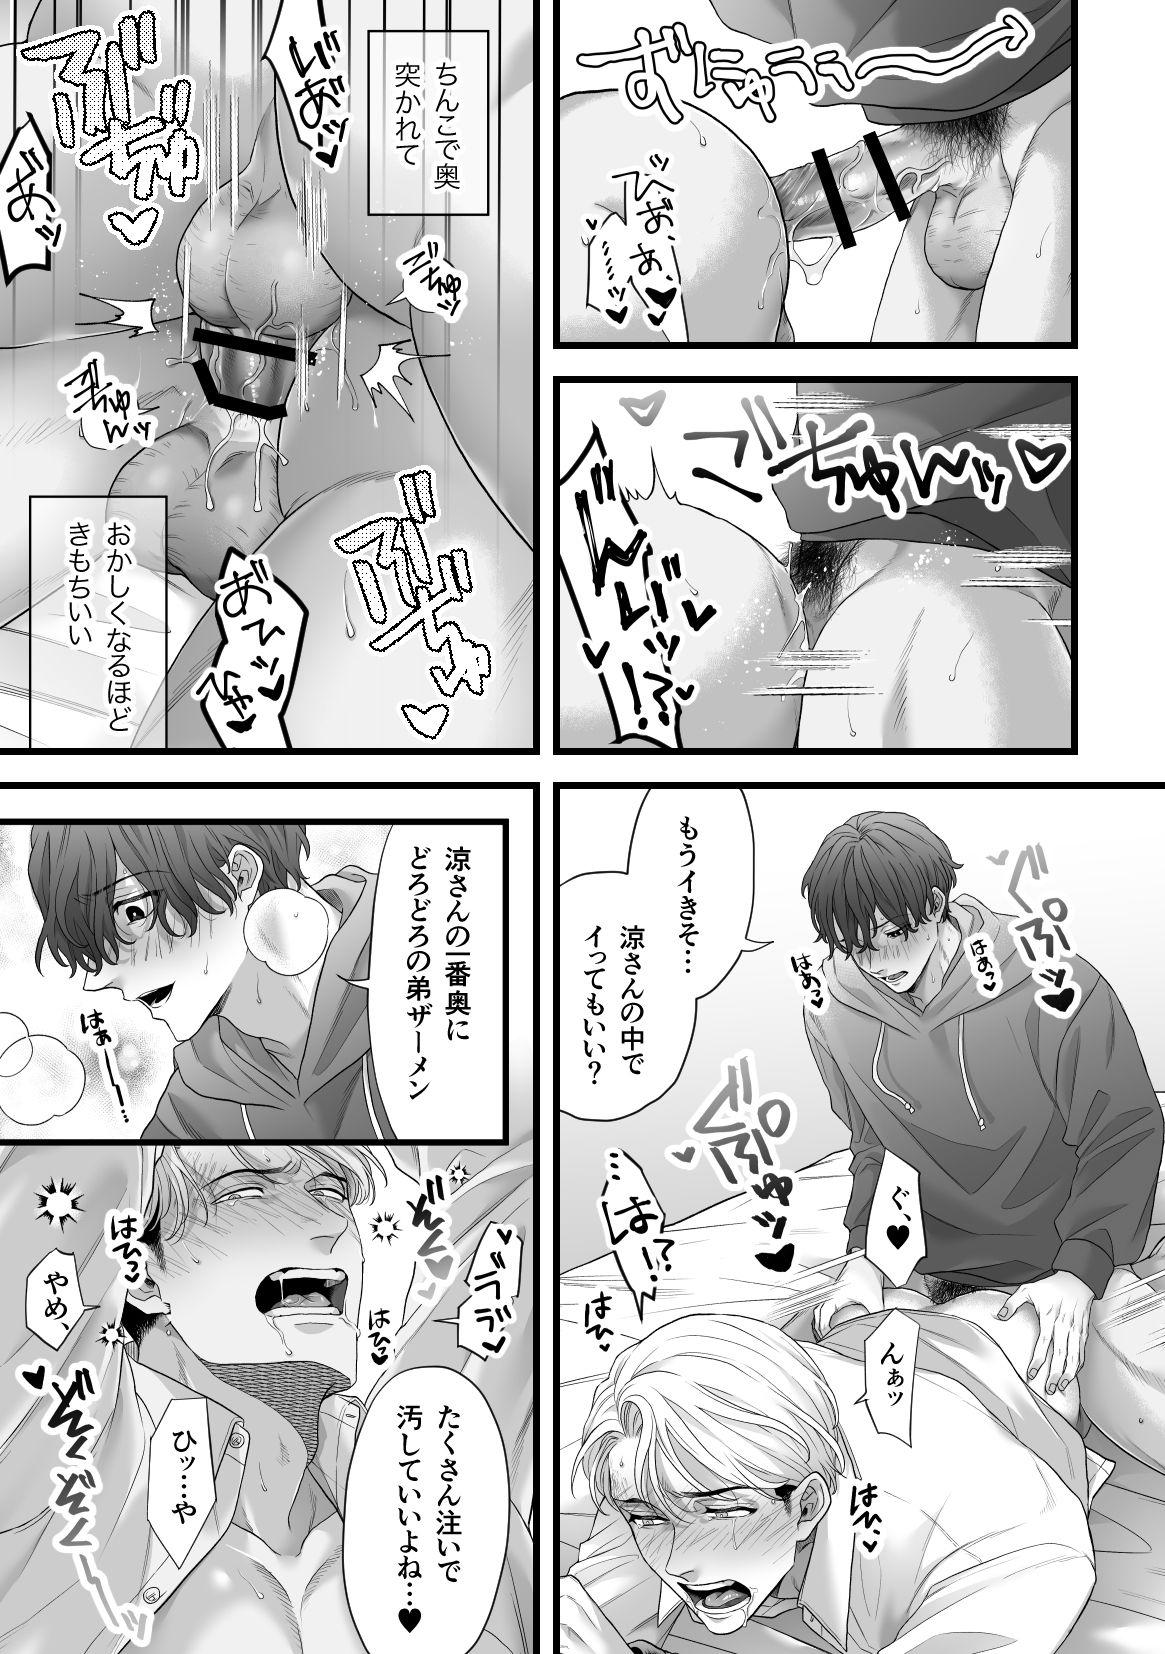 Gikei Ryoujoku 18